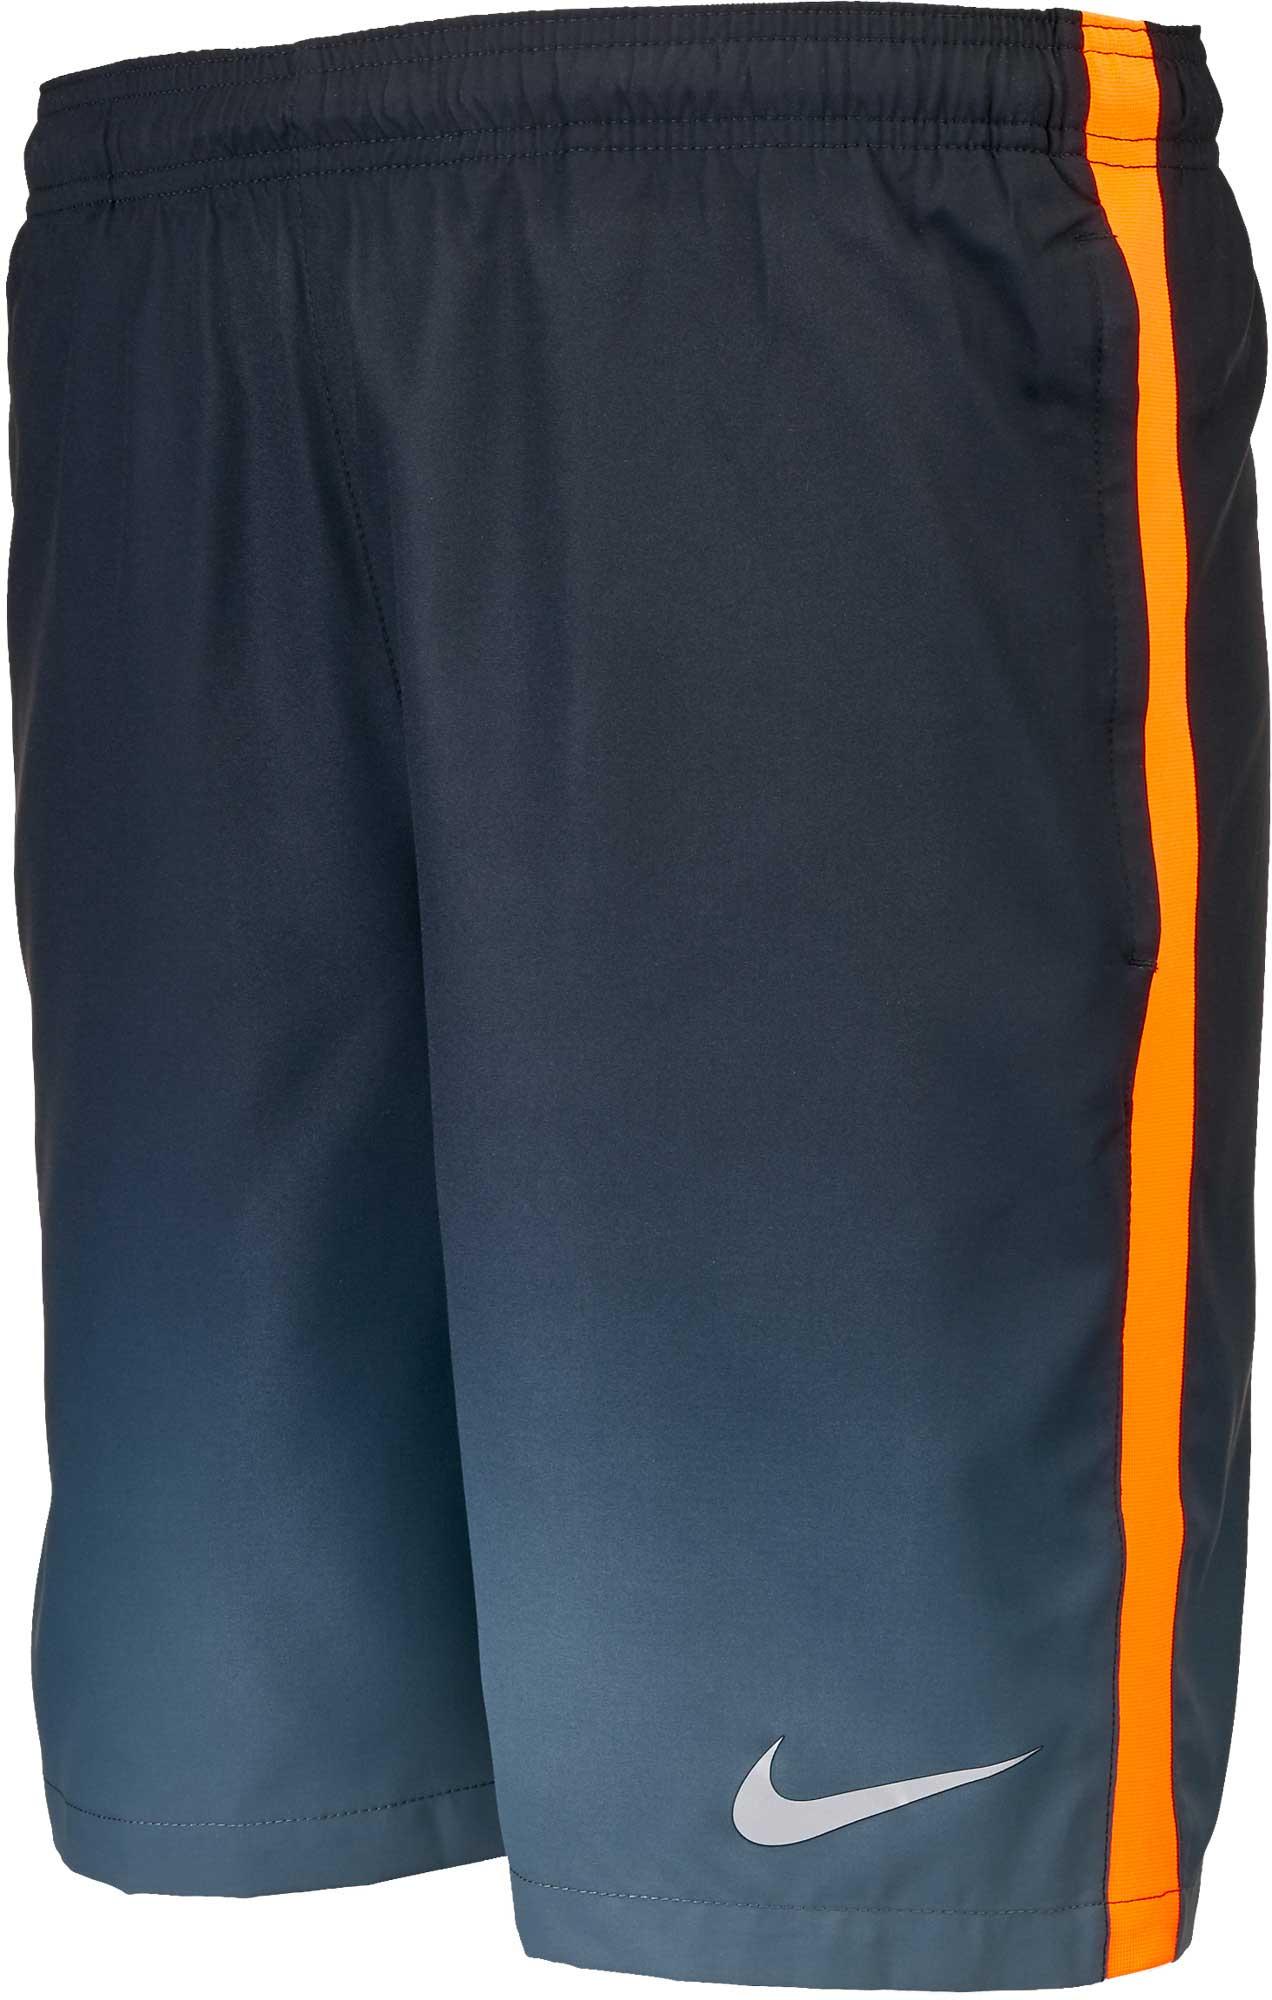 Nike Squad Training Short - CR7 - Cool Grey   Tart - Soccer Master 1b37a828f9619